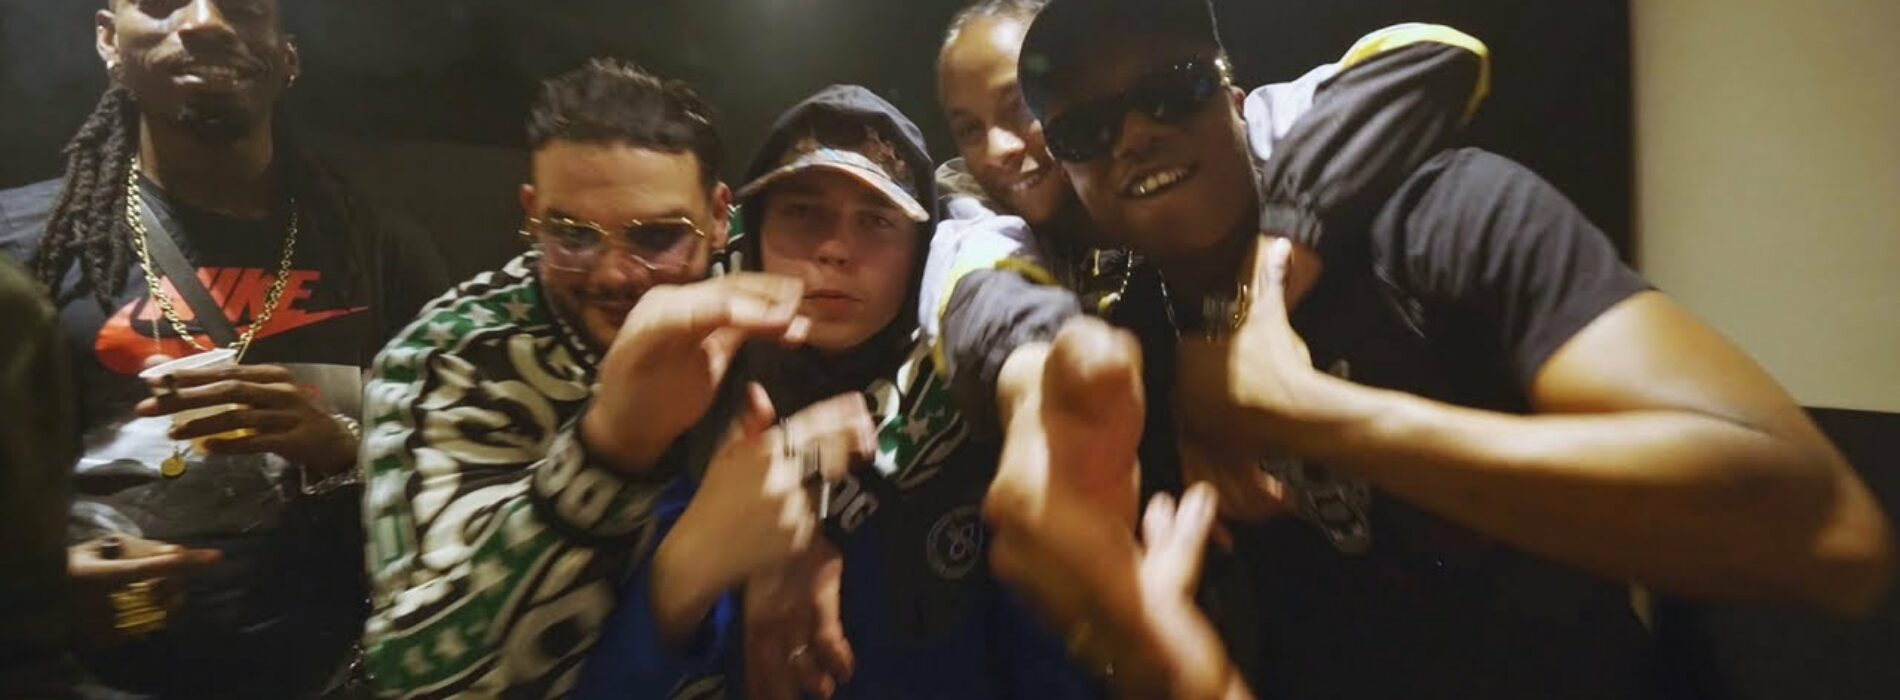 Tiitof (ft. Cheu-b, Zeguerre, Kanoé & Sadek) – Bad Boy (Remix) – Juin 2021